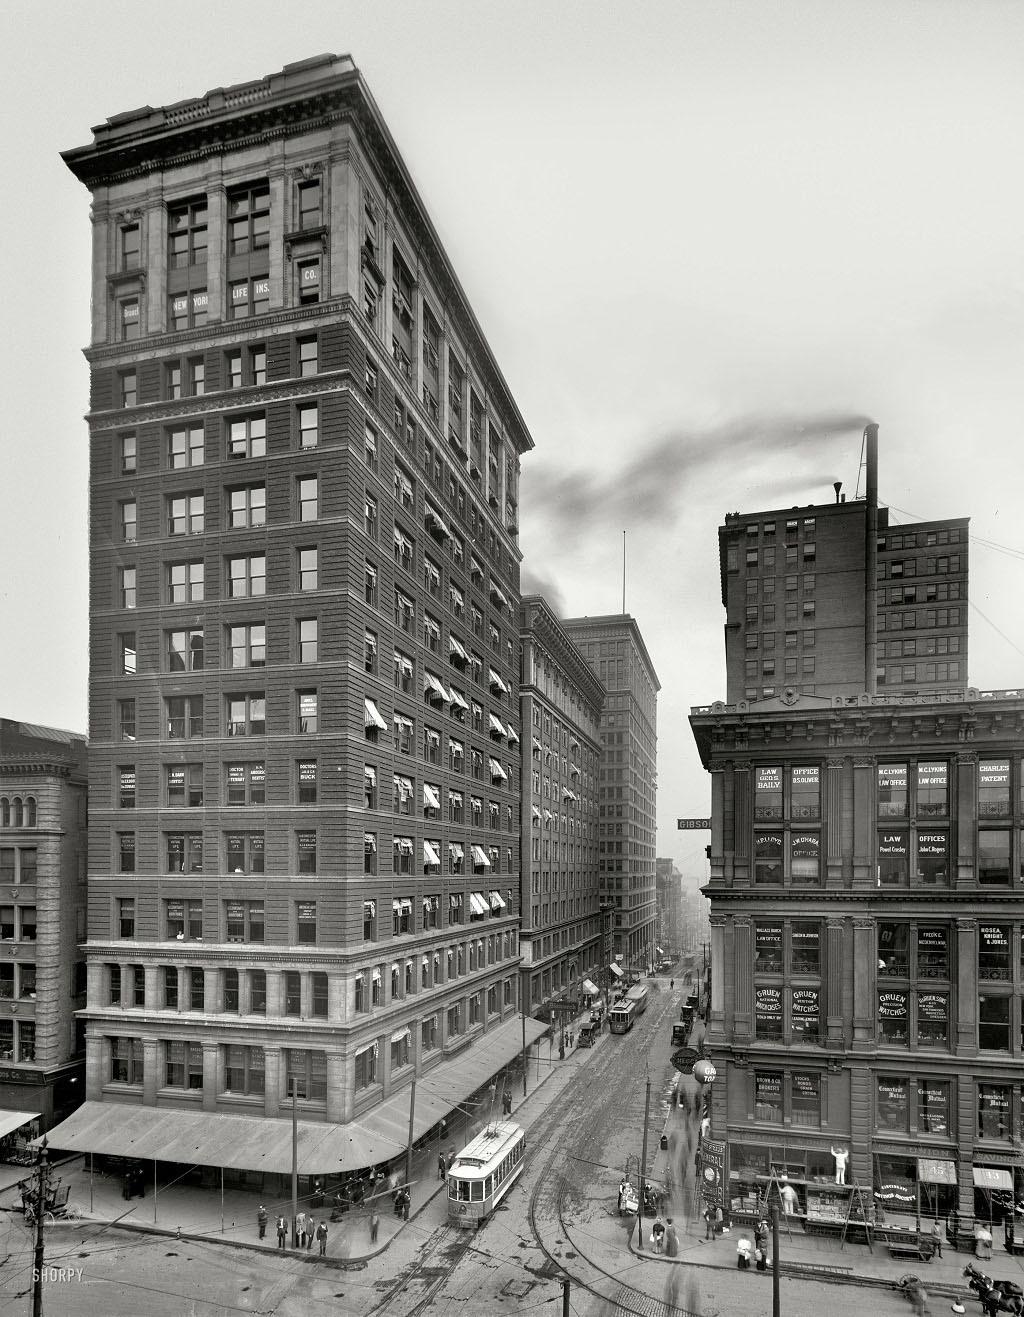 Валнут-стрит, Цинциннати, штат Огайо, 1910 год.